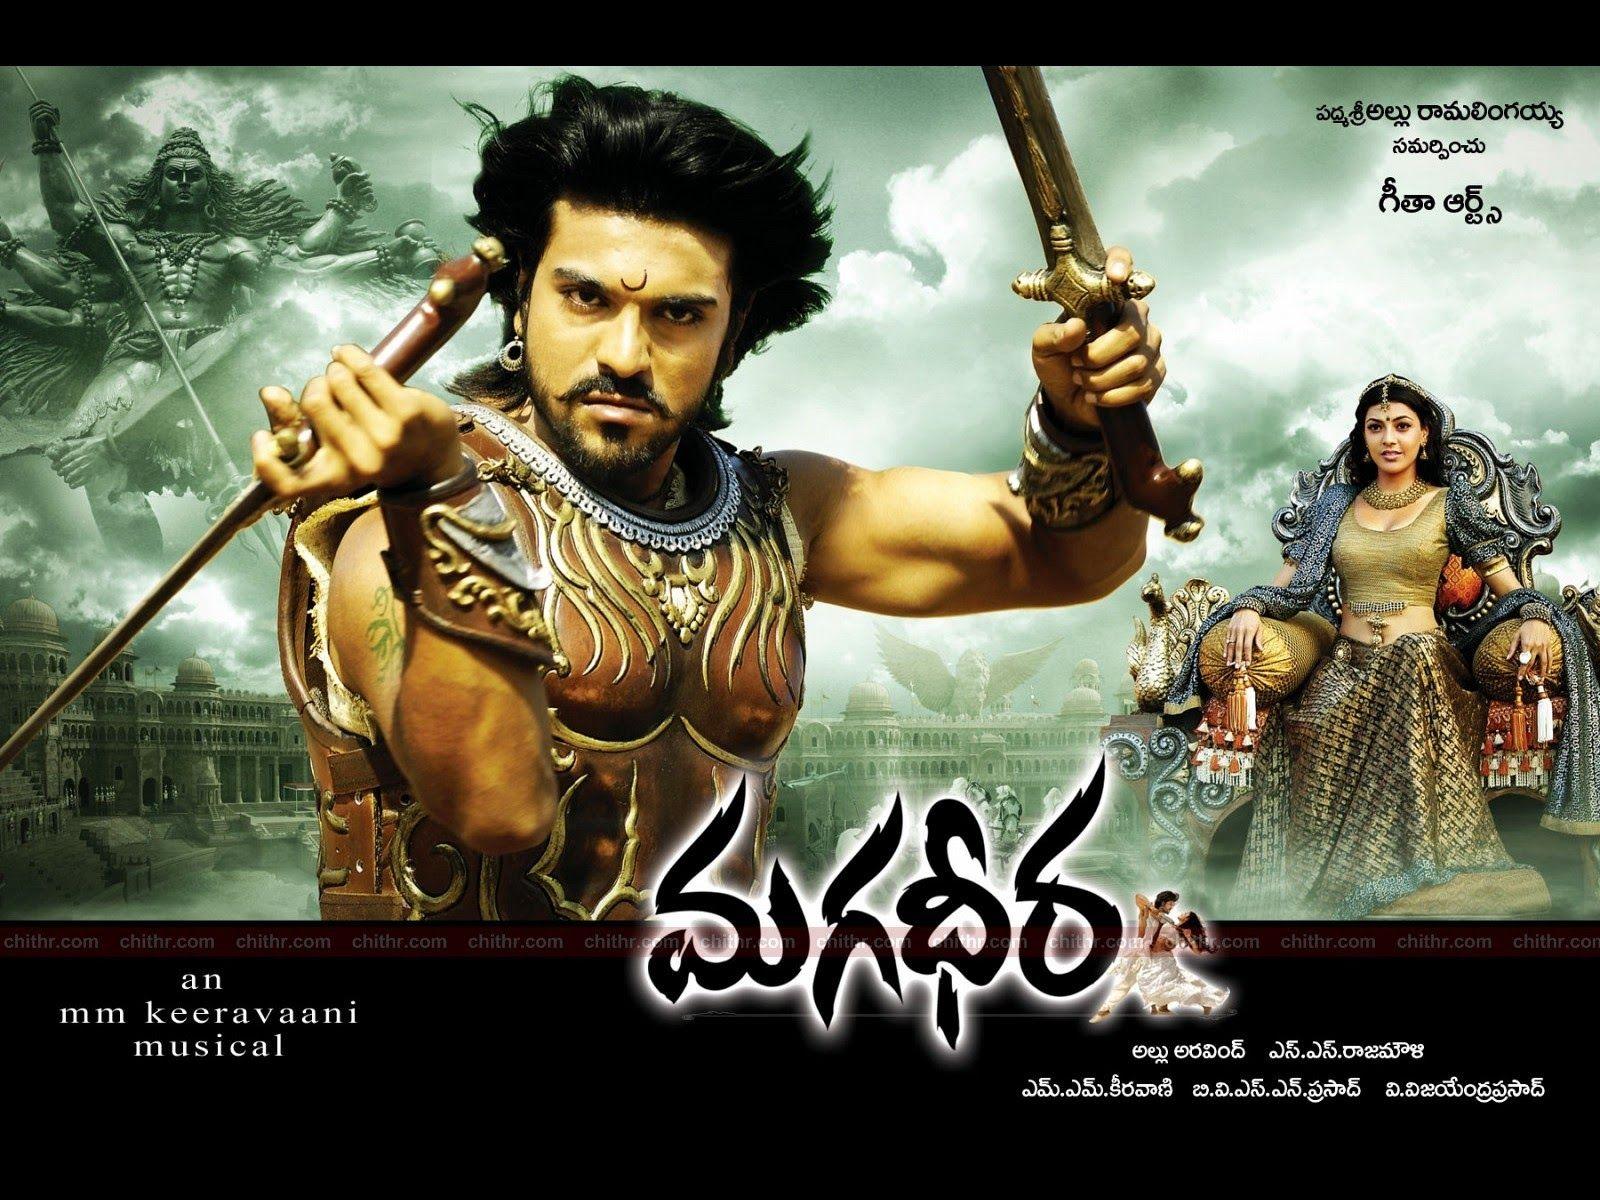 Ram Charan, Kajal Aggarwal south indian movie Magadheera is second biggest film in Tollywood wiki